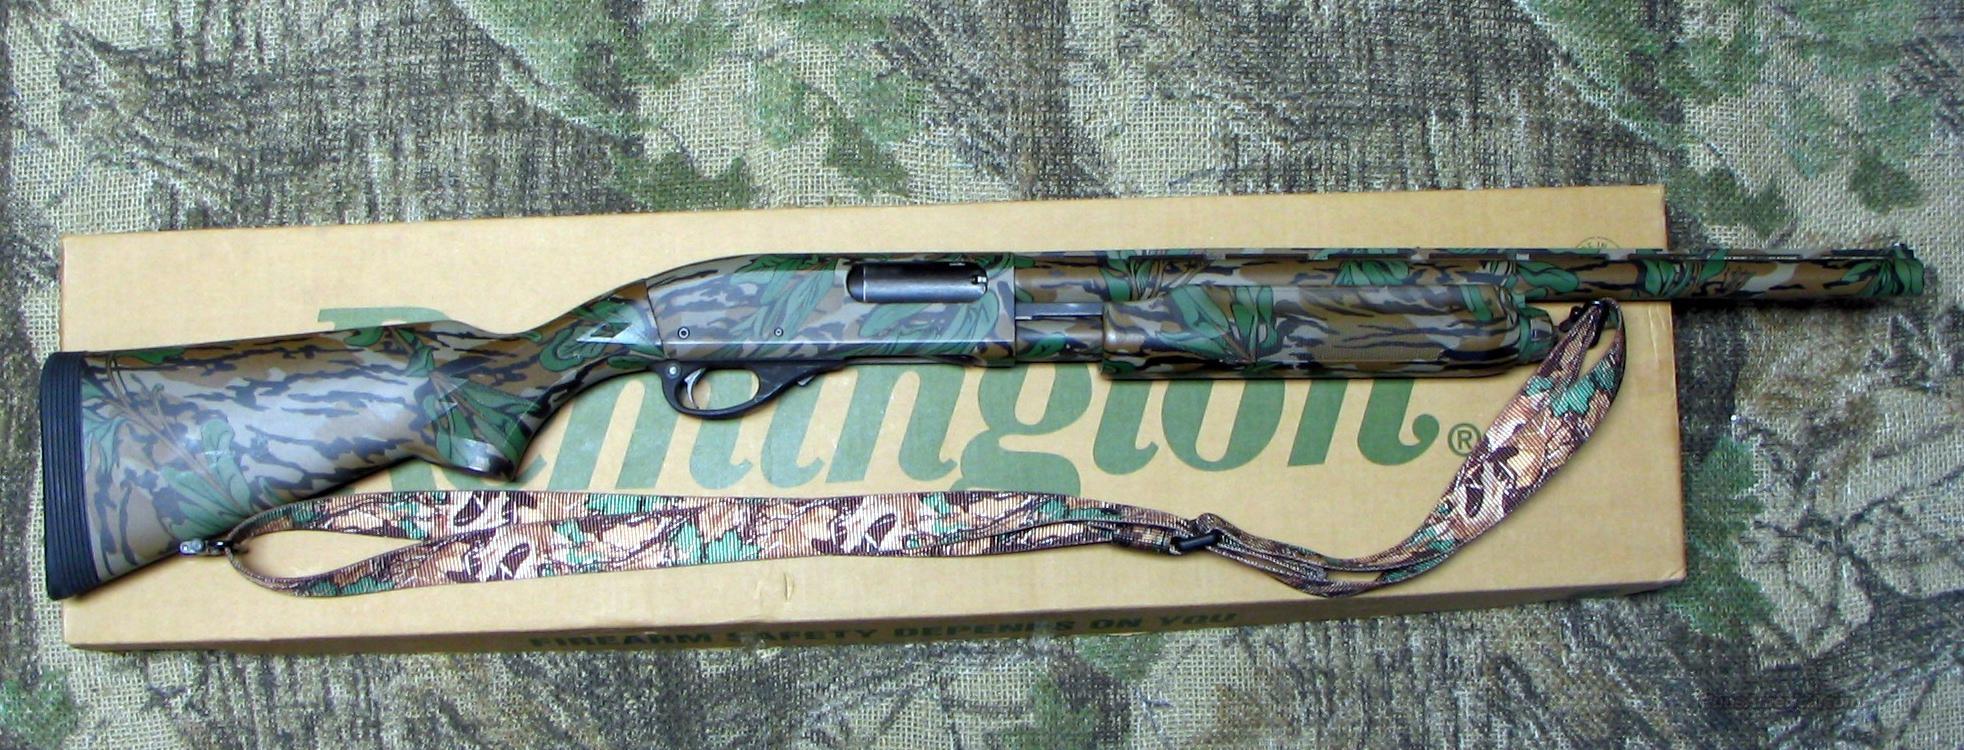 Remington 870 Magnum Green Leaf Camo 12 Ga S For Sale